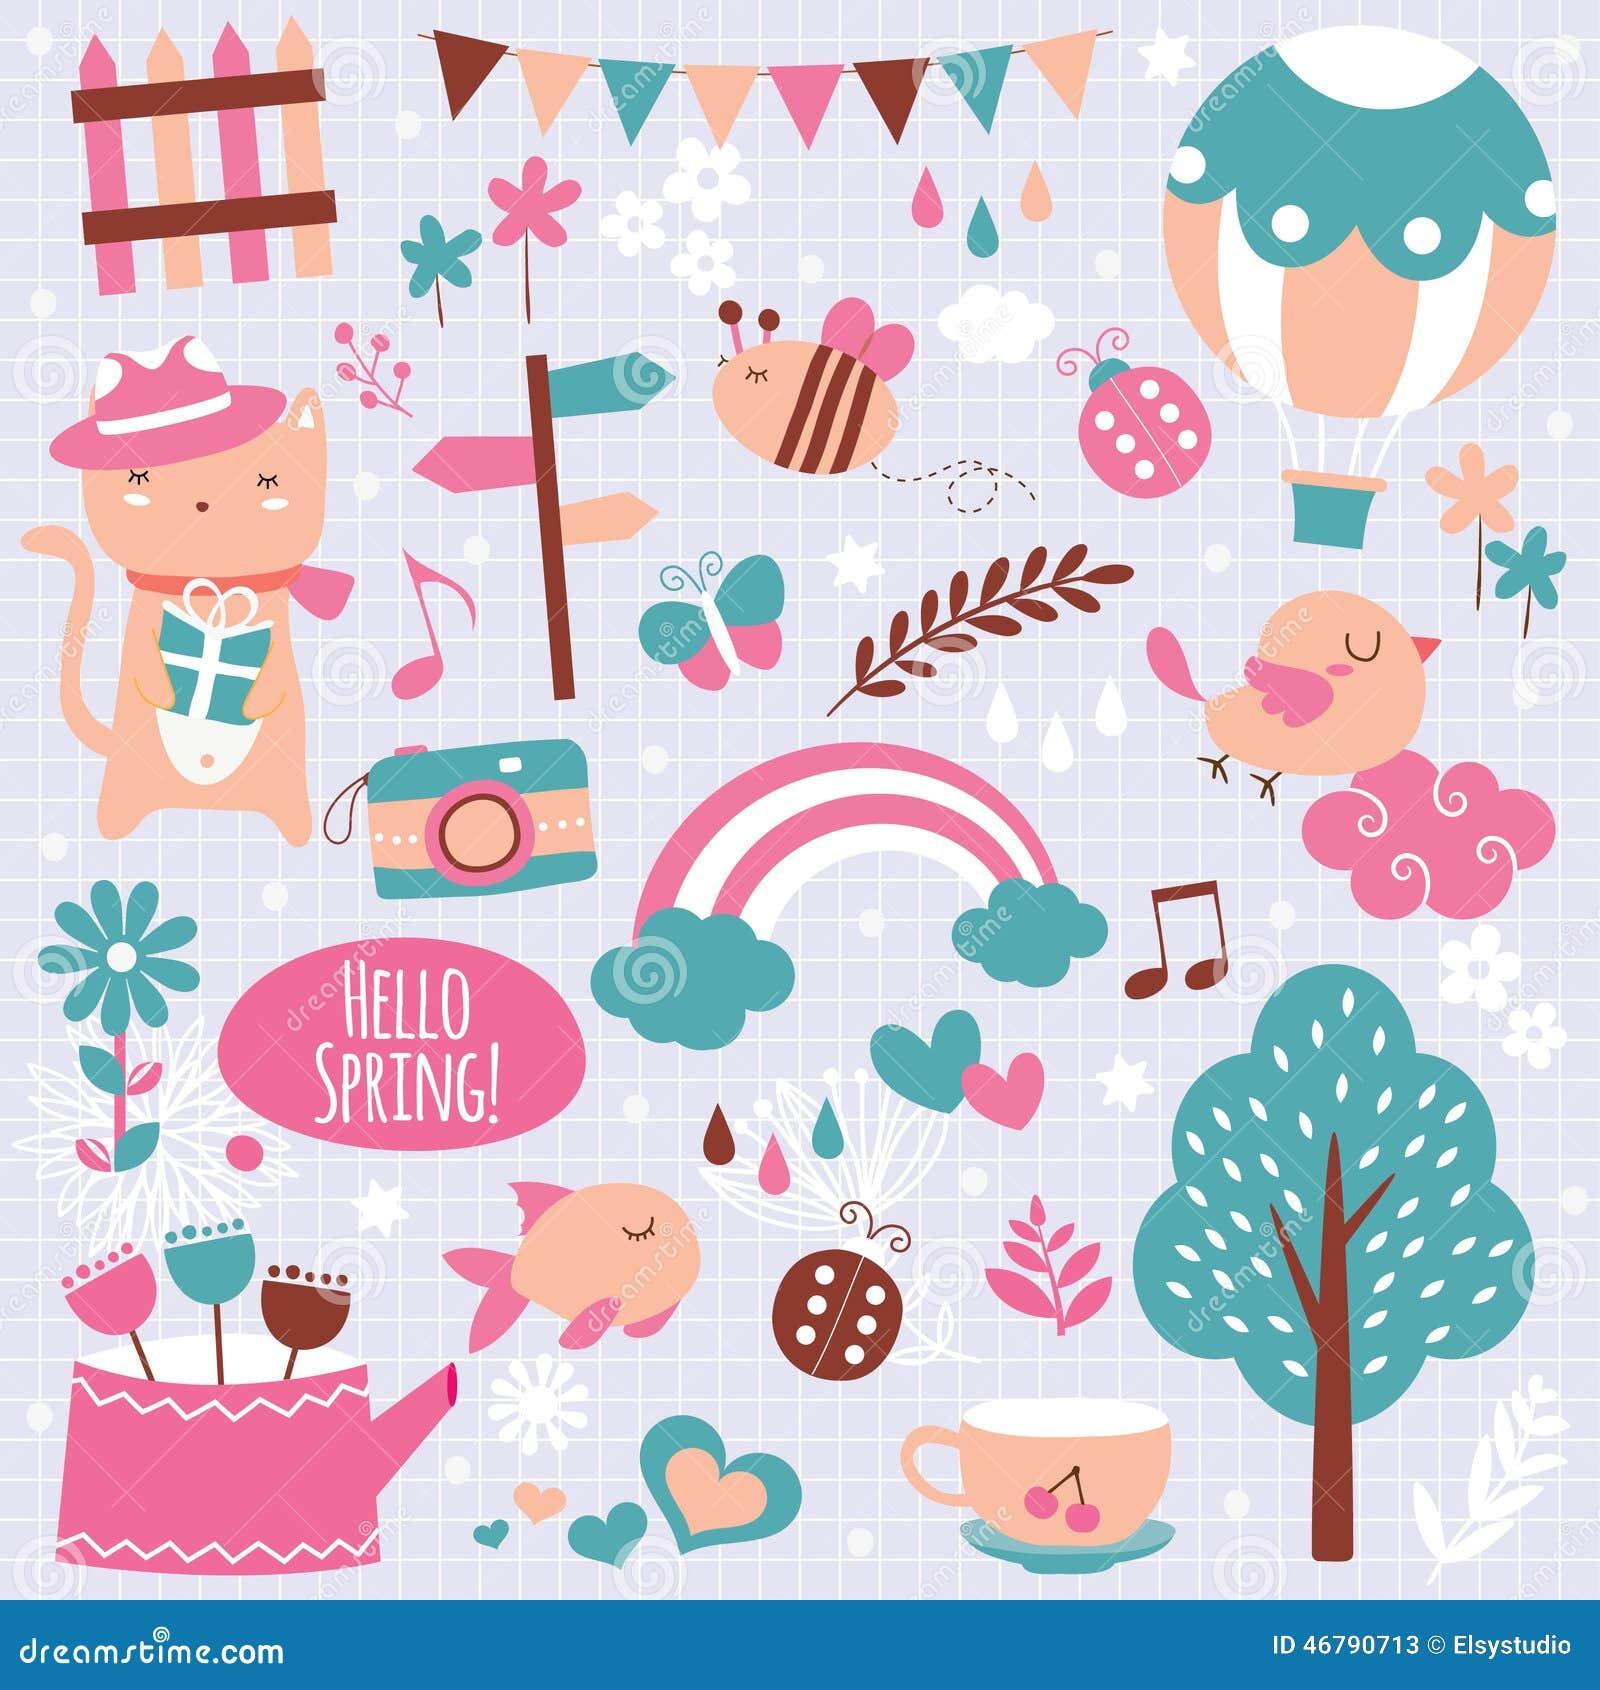 Spring season clip art elements